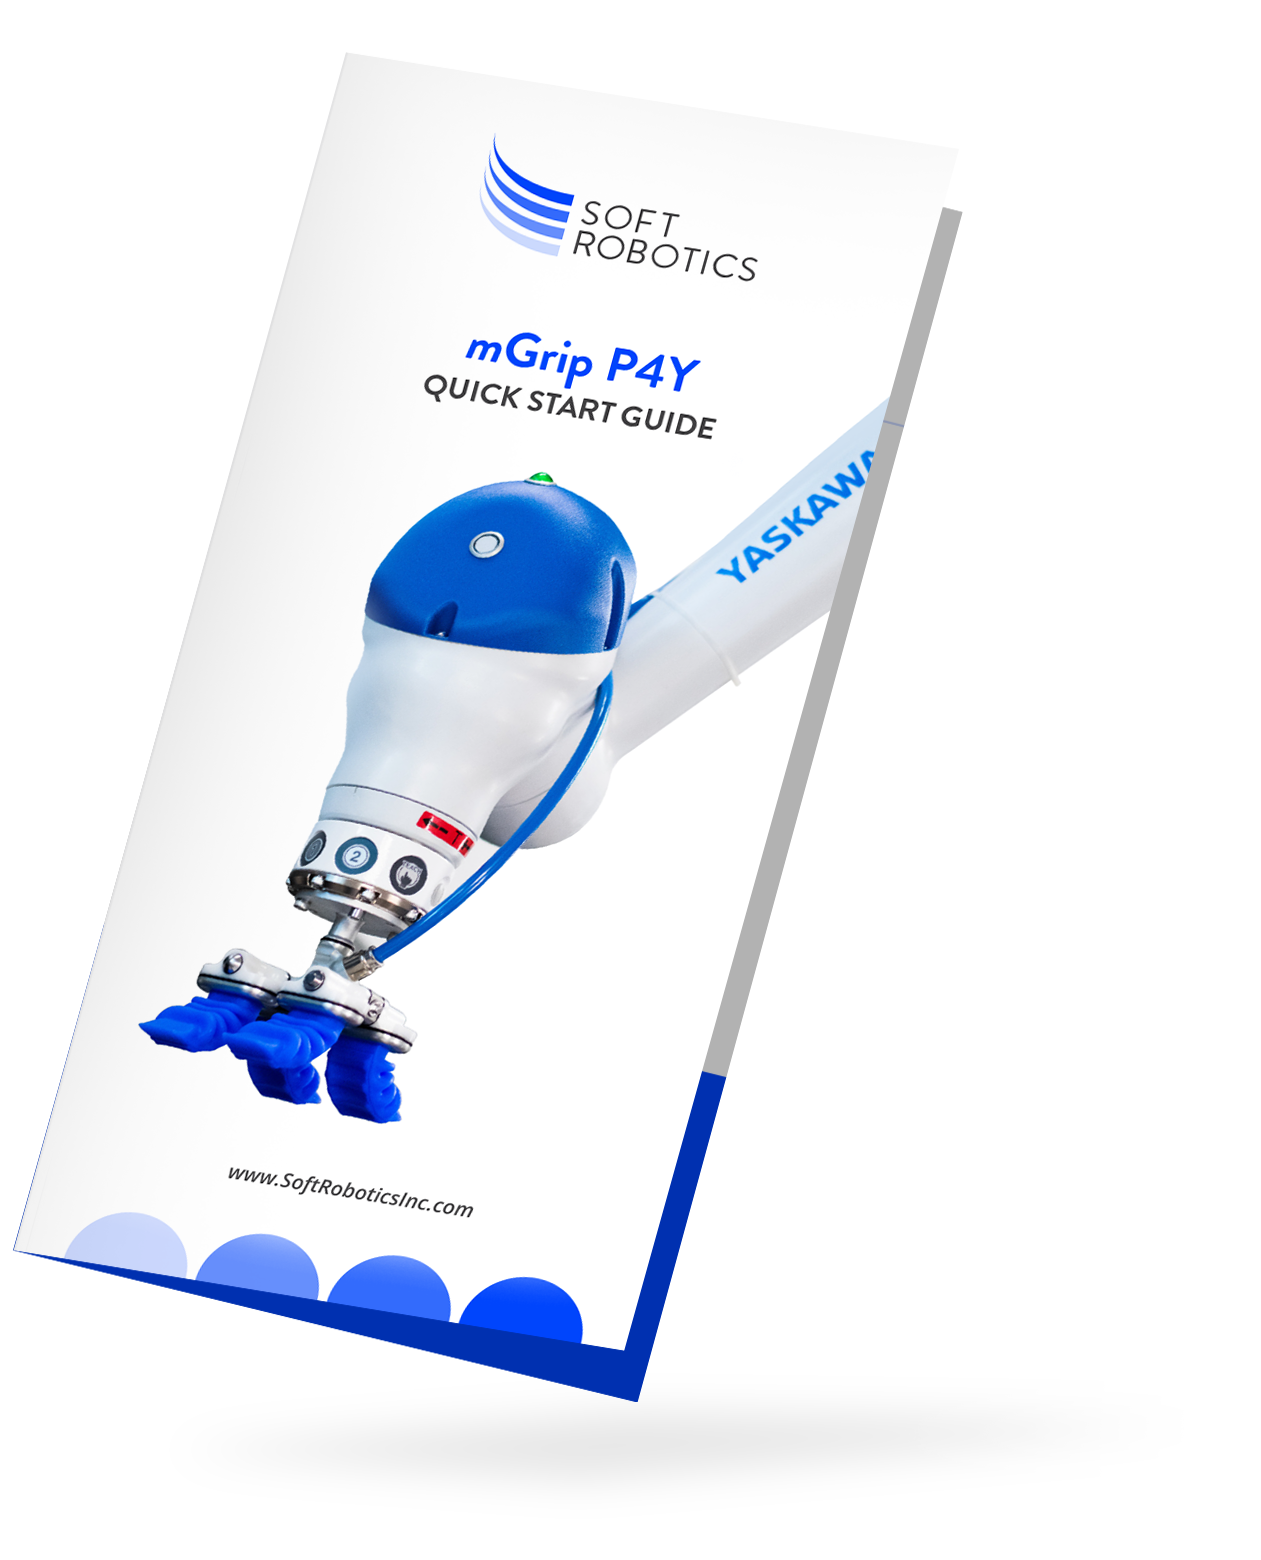 mGrip P4Y QSG Mockup.png